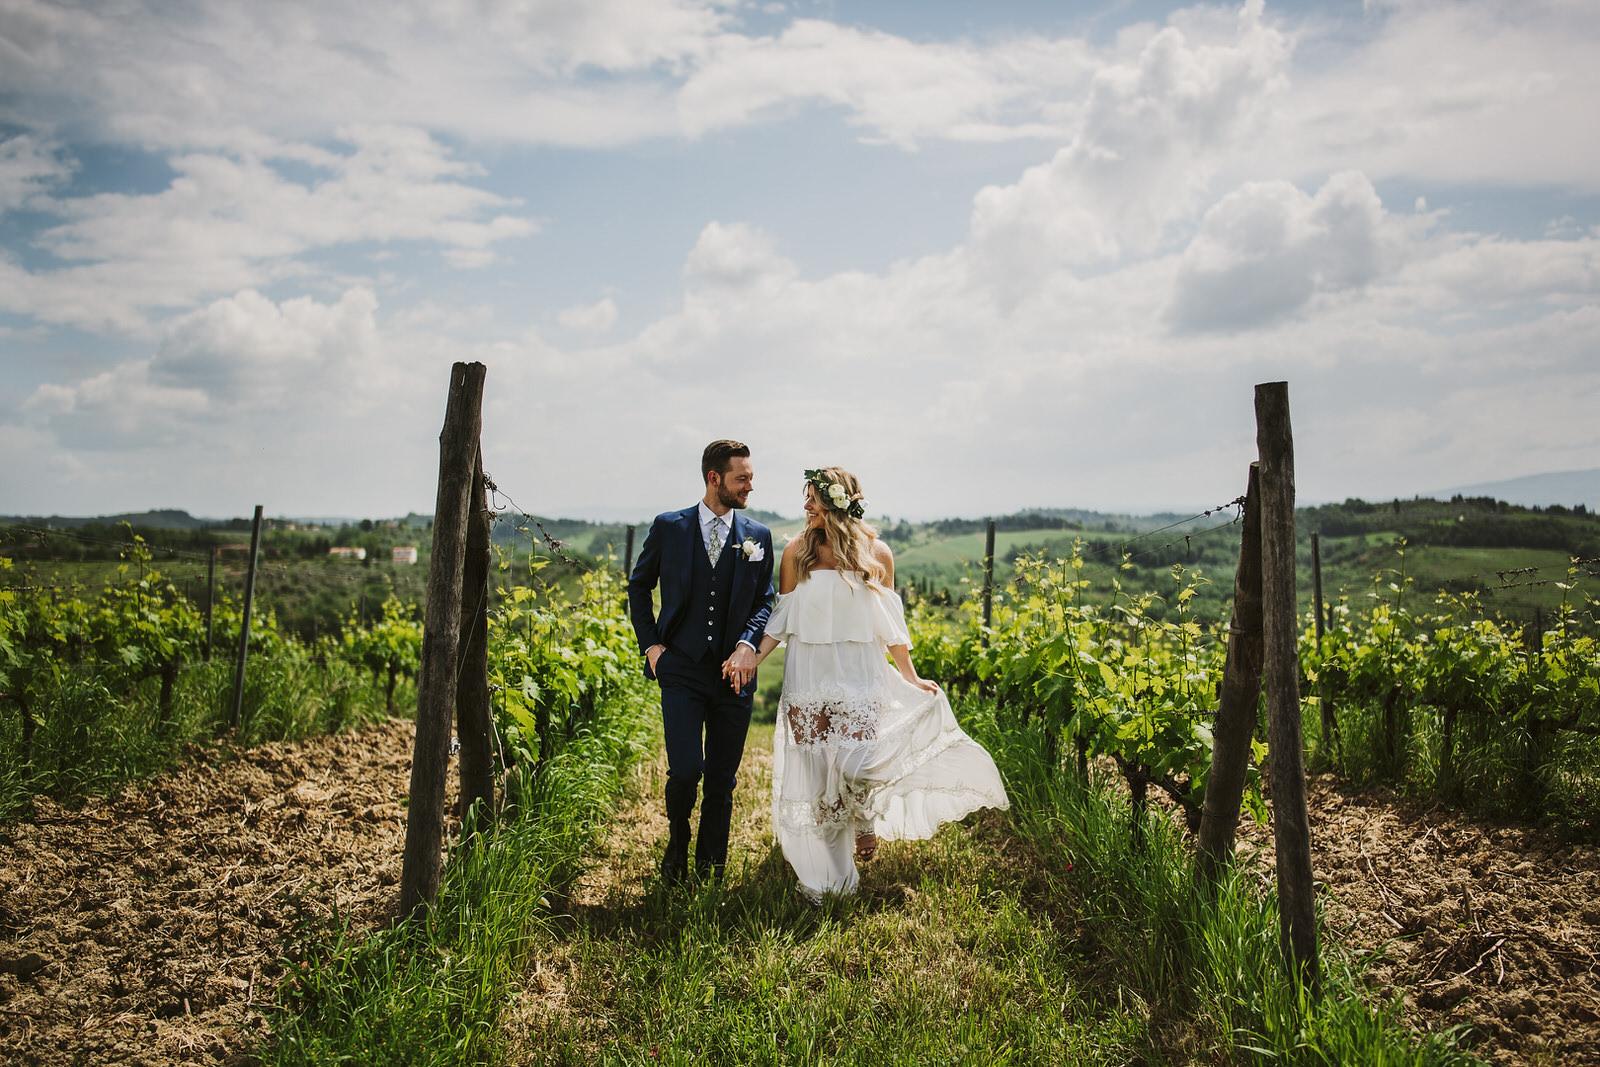 wedding photographer in italy-venice-tuscany-florence-amalfi coast-como lake-villa del balbianello-siena-amalfi-ravello-belmond-villa cimbrone58